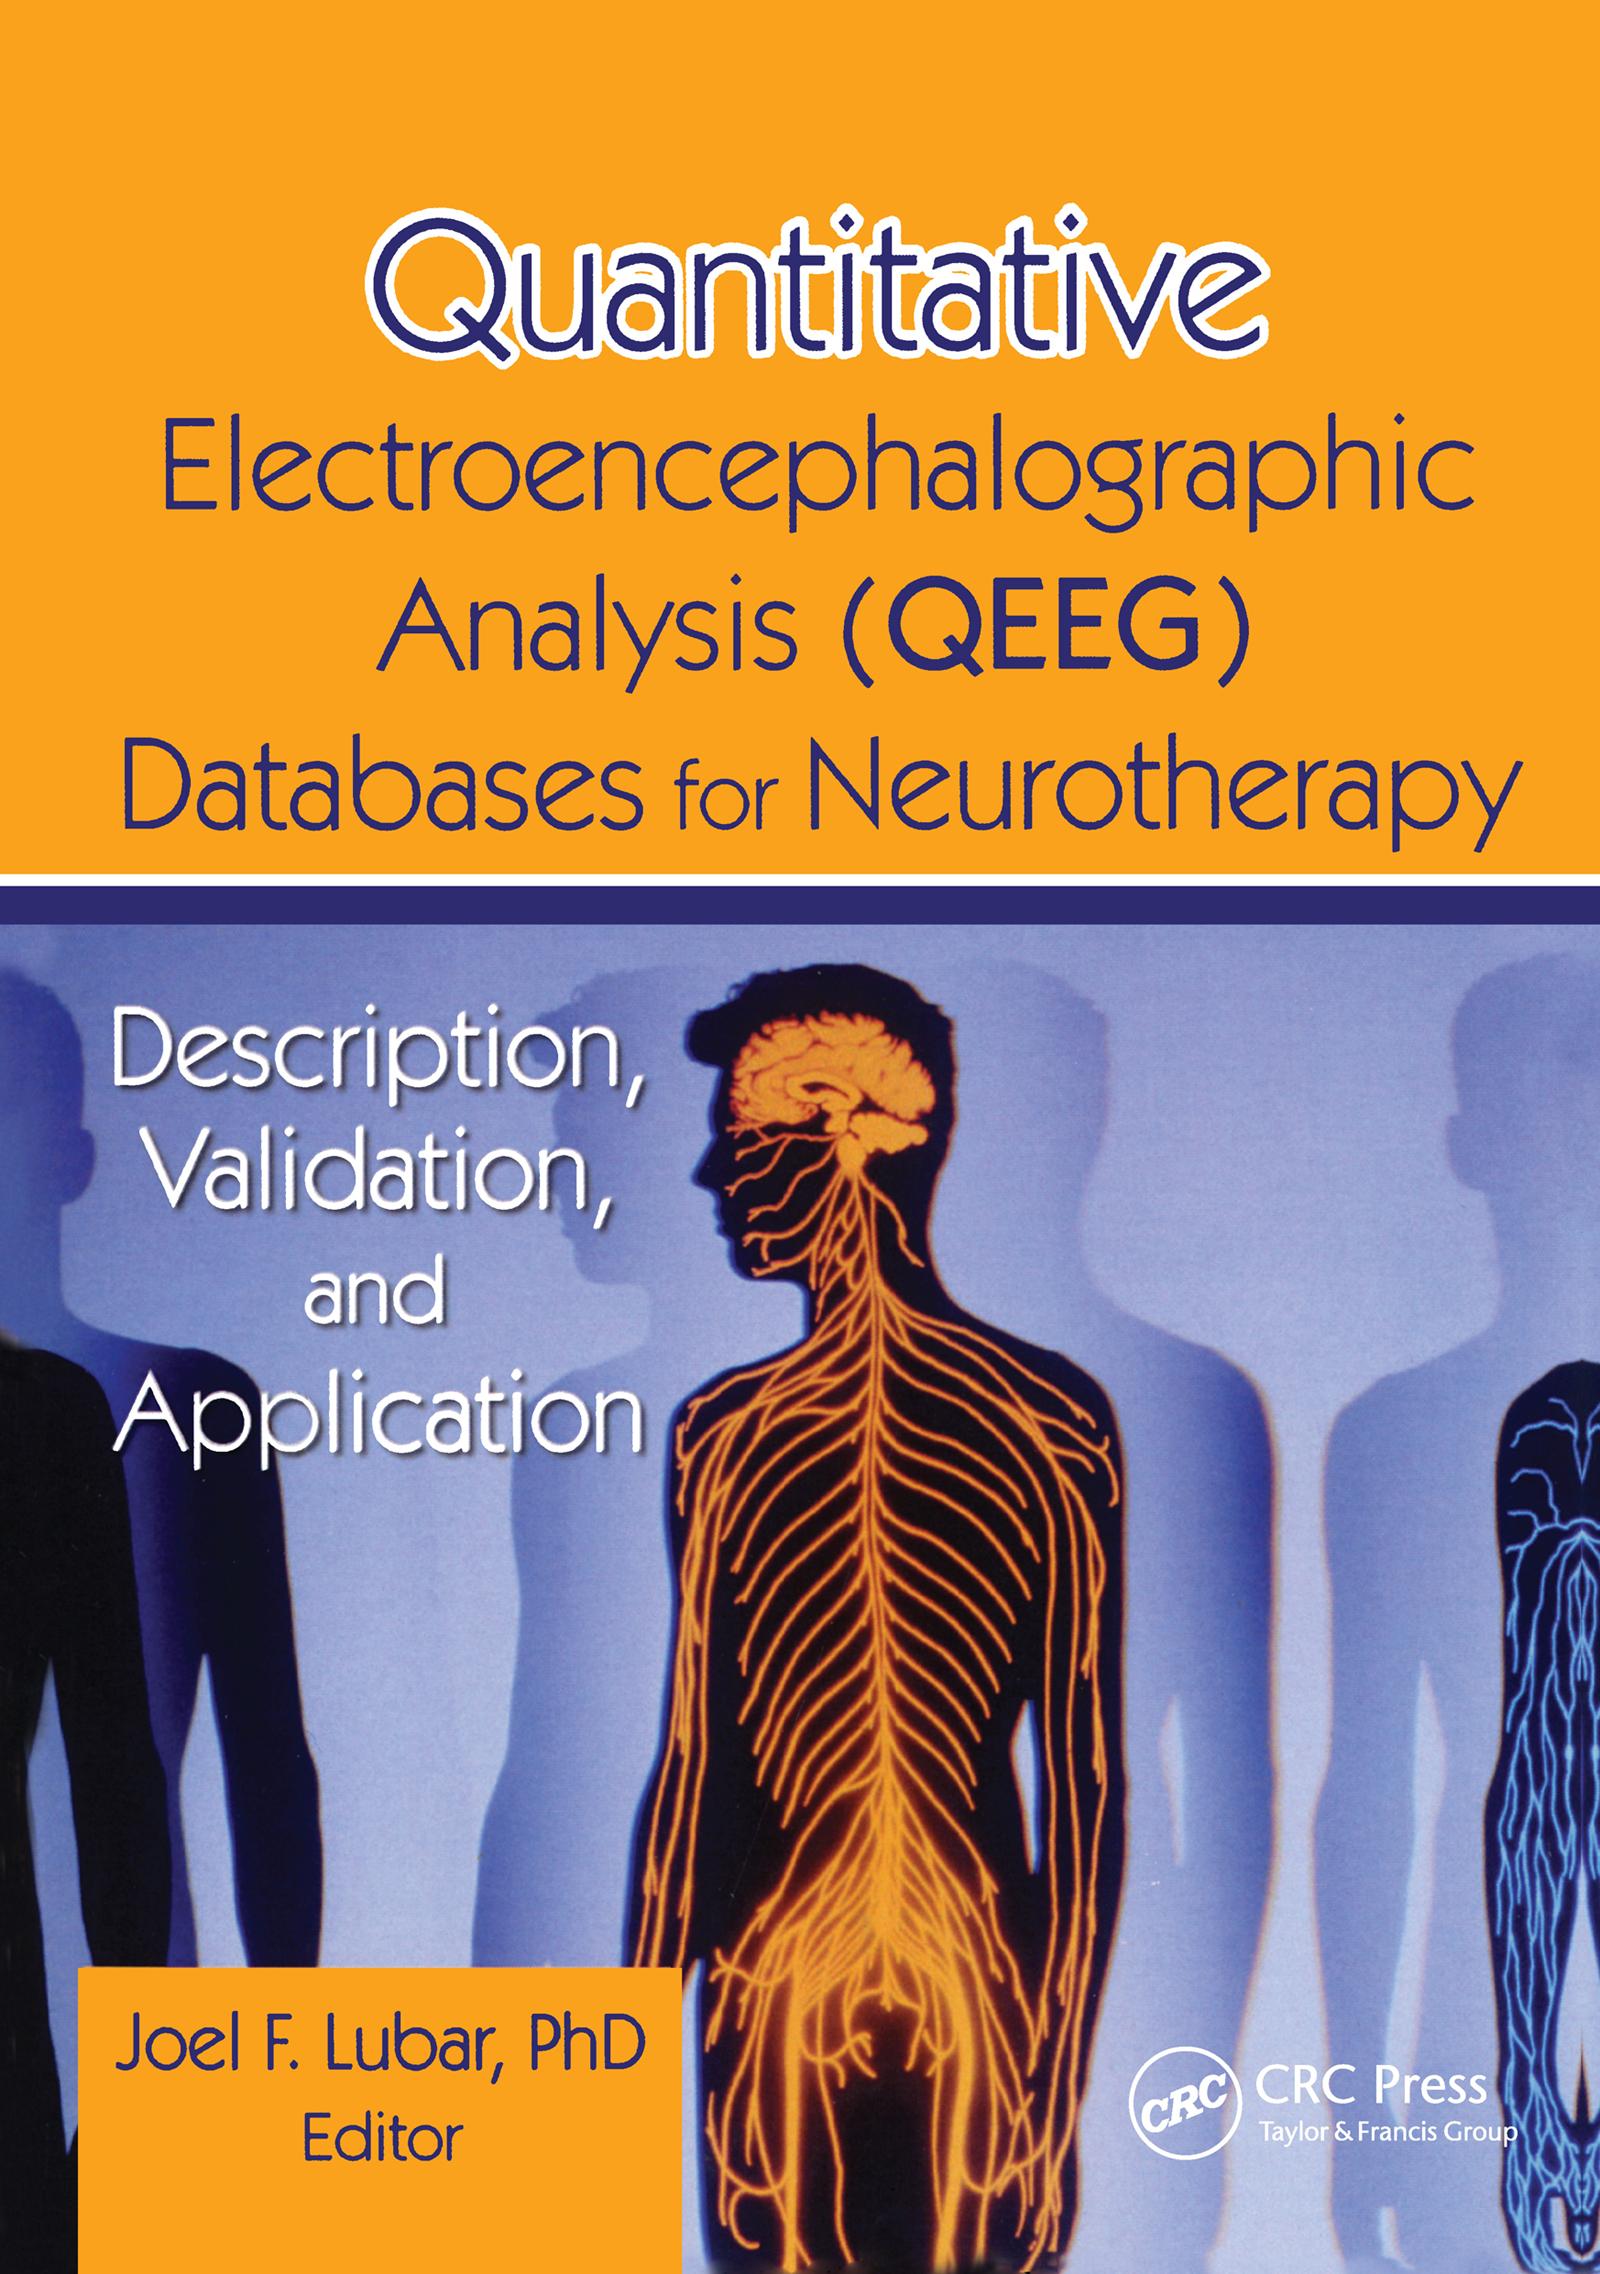 Quantitative Electroencephalographic Analysis (QEEG) Databases for Neurotherapy